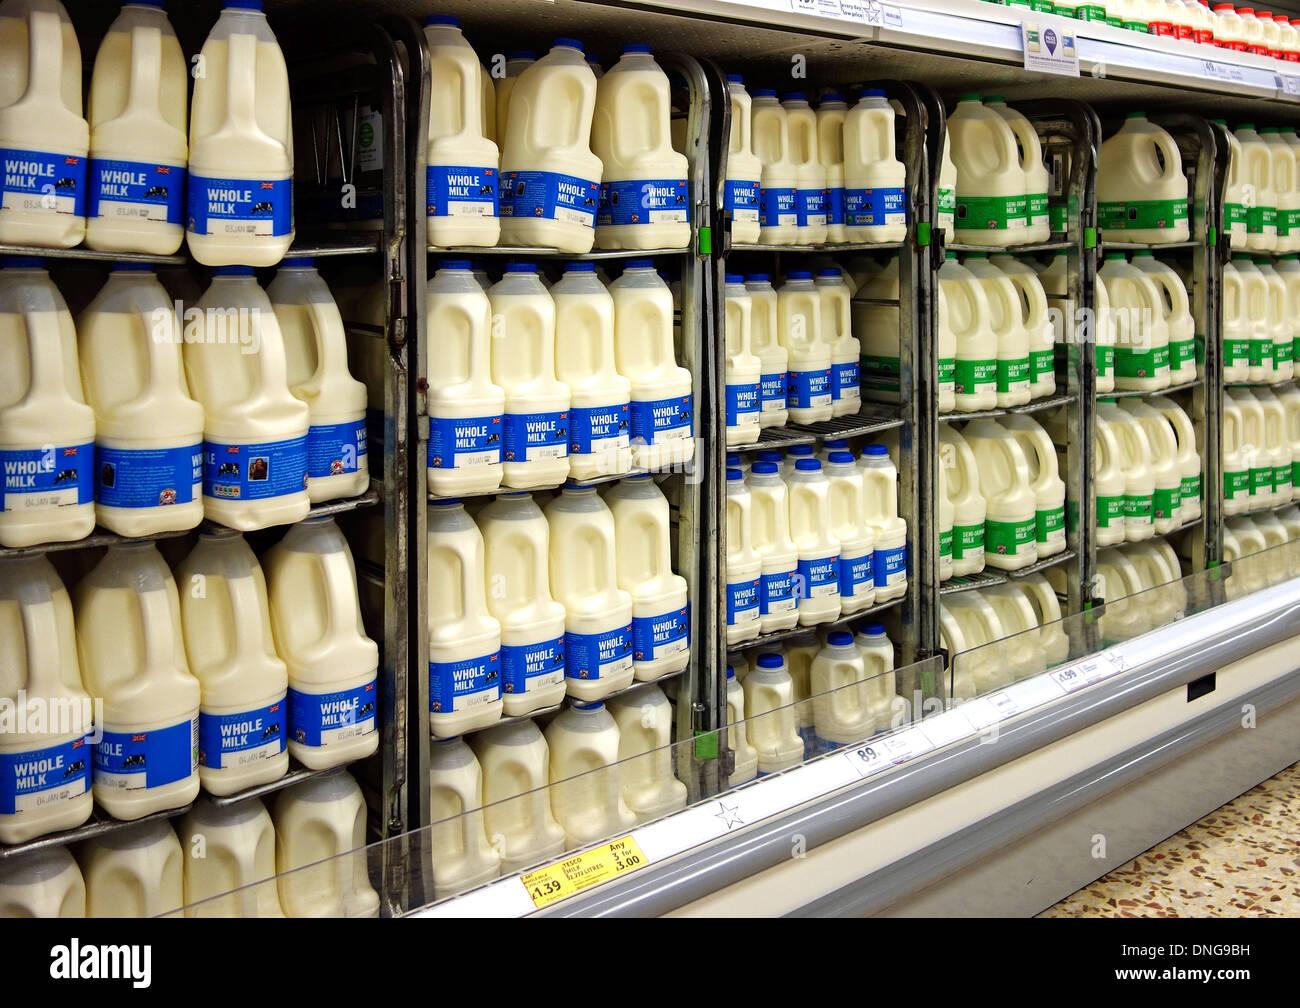 Milk and supermarkets